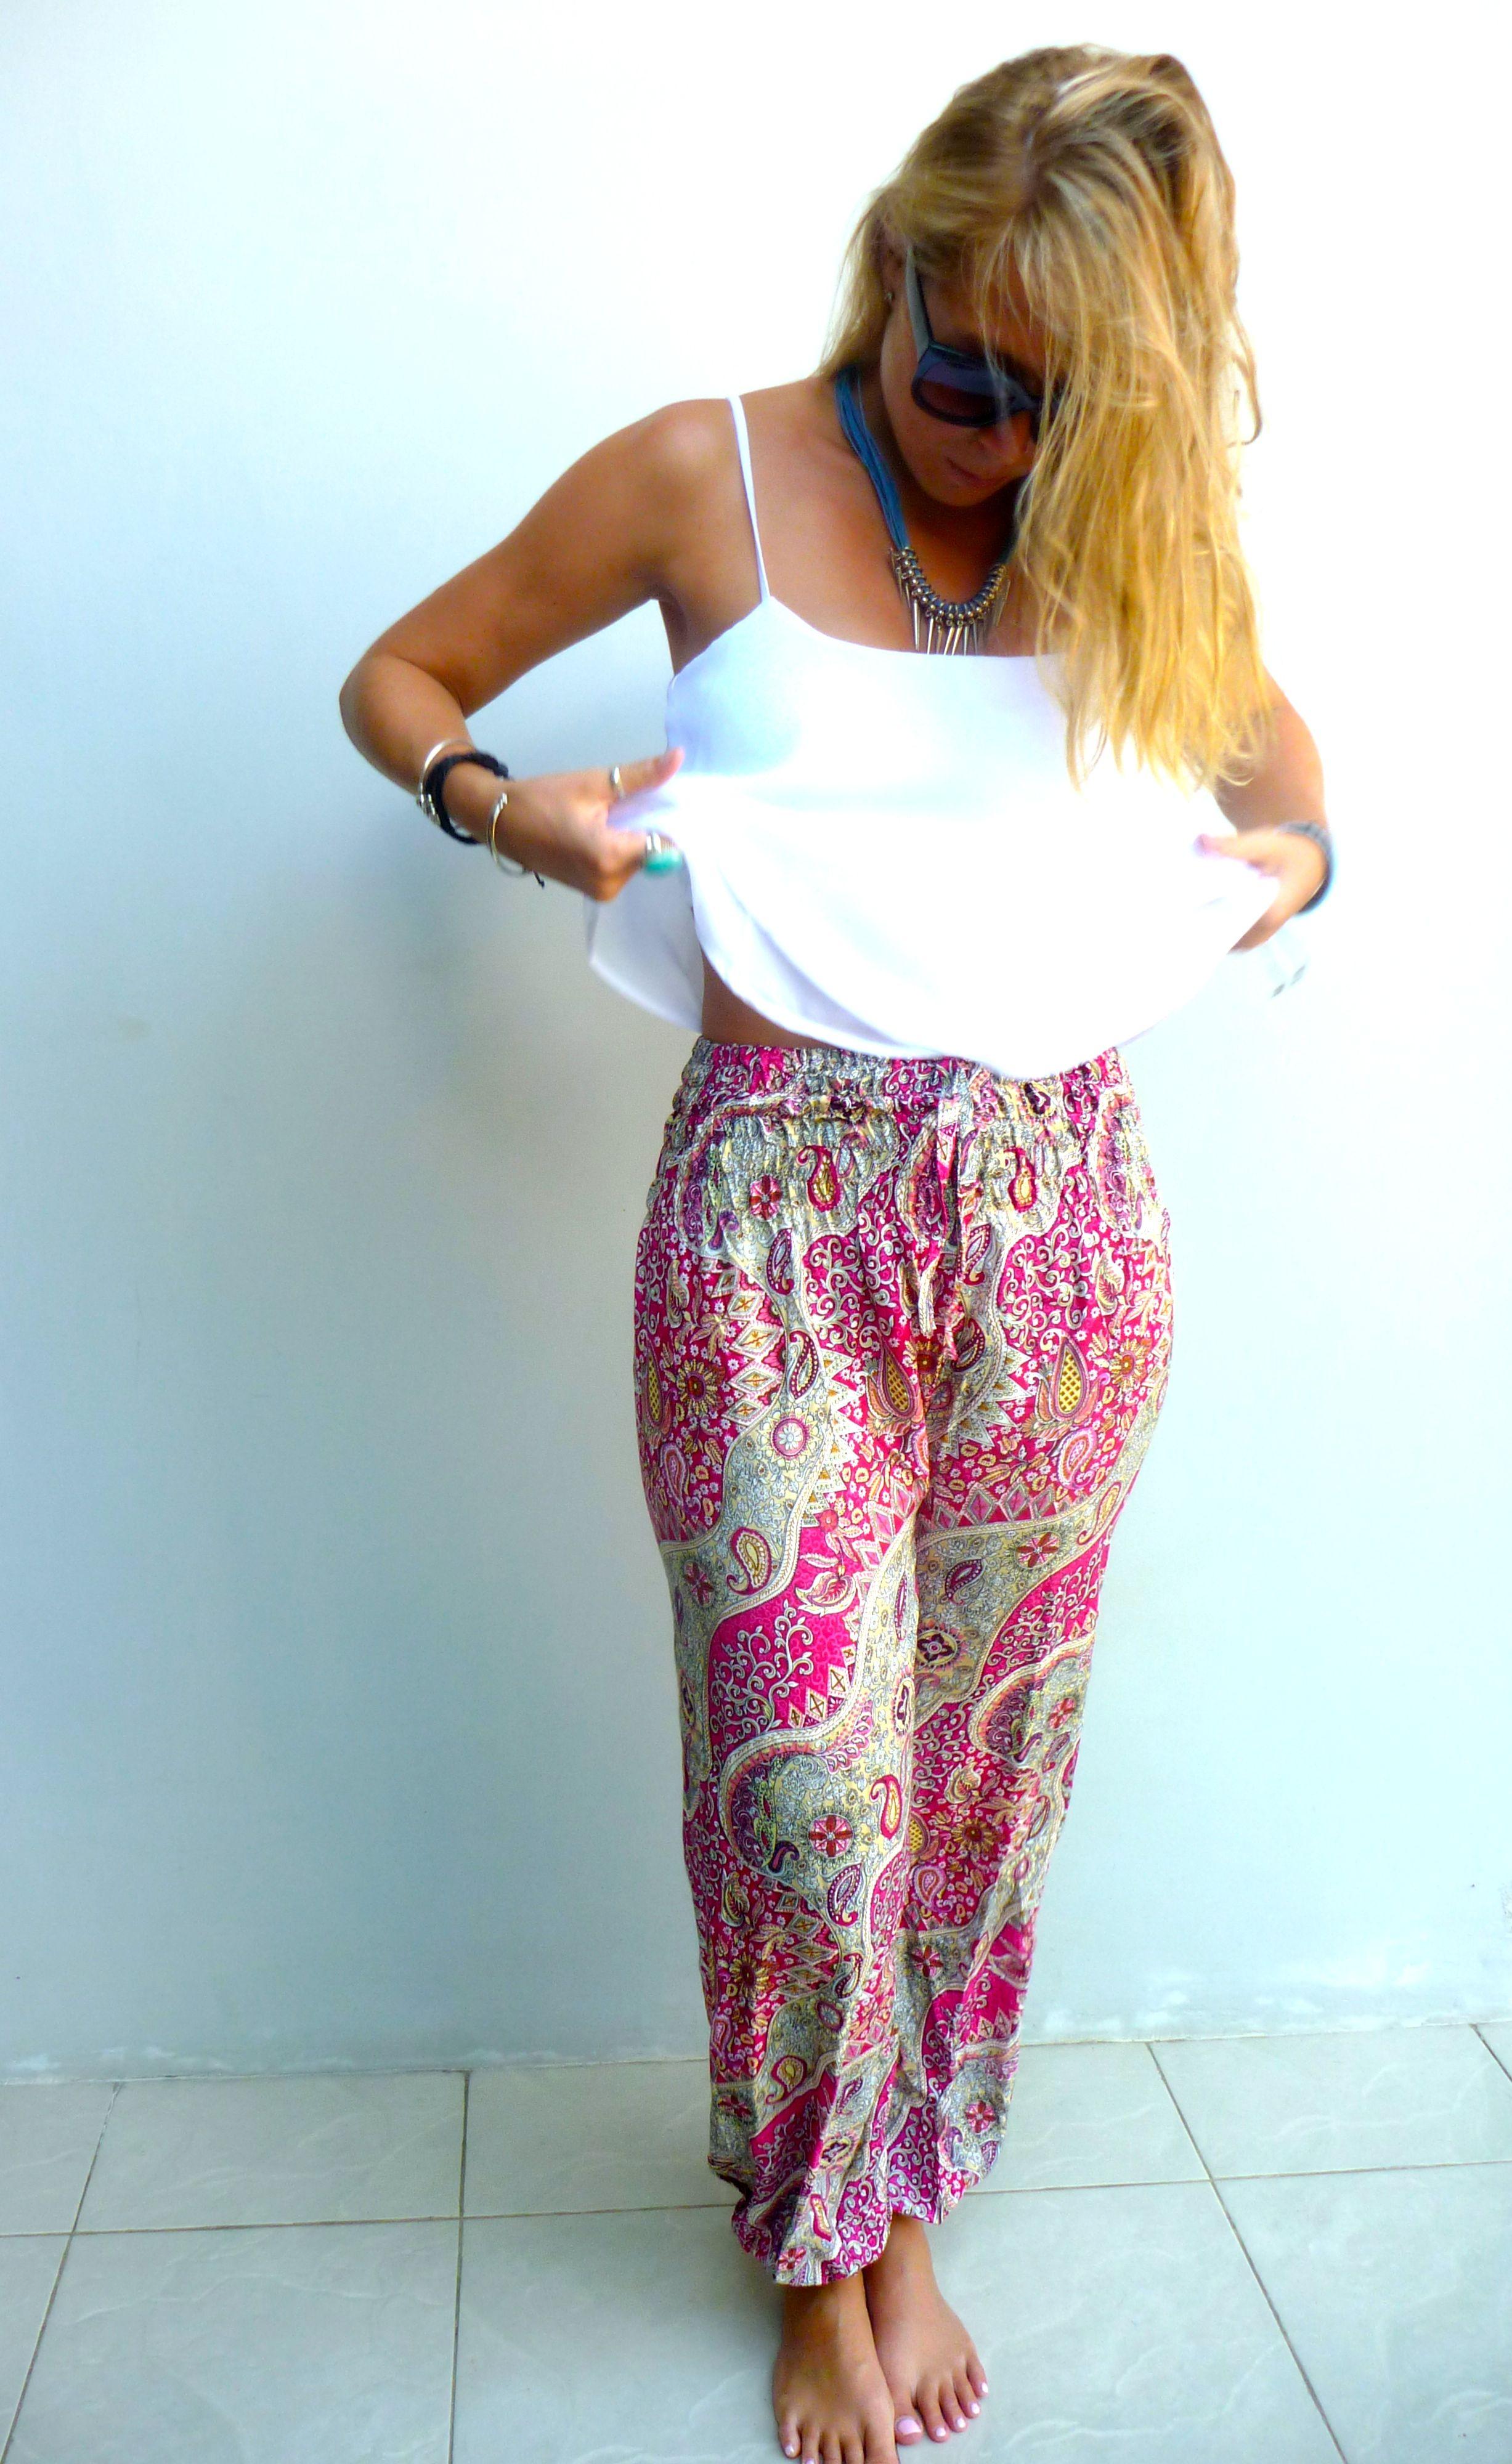 ccd721f950f4 Bali Wanderlust Boho Harem Pants -  Paisley Pinks   20 + more colors styles